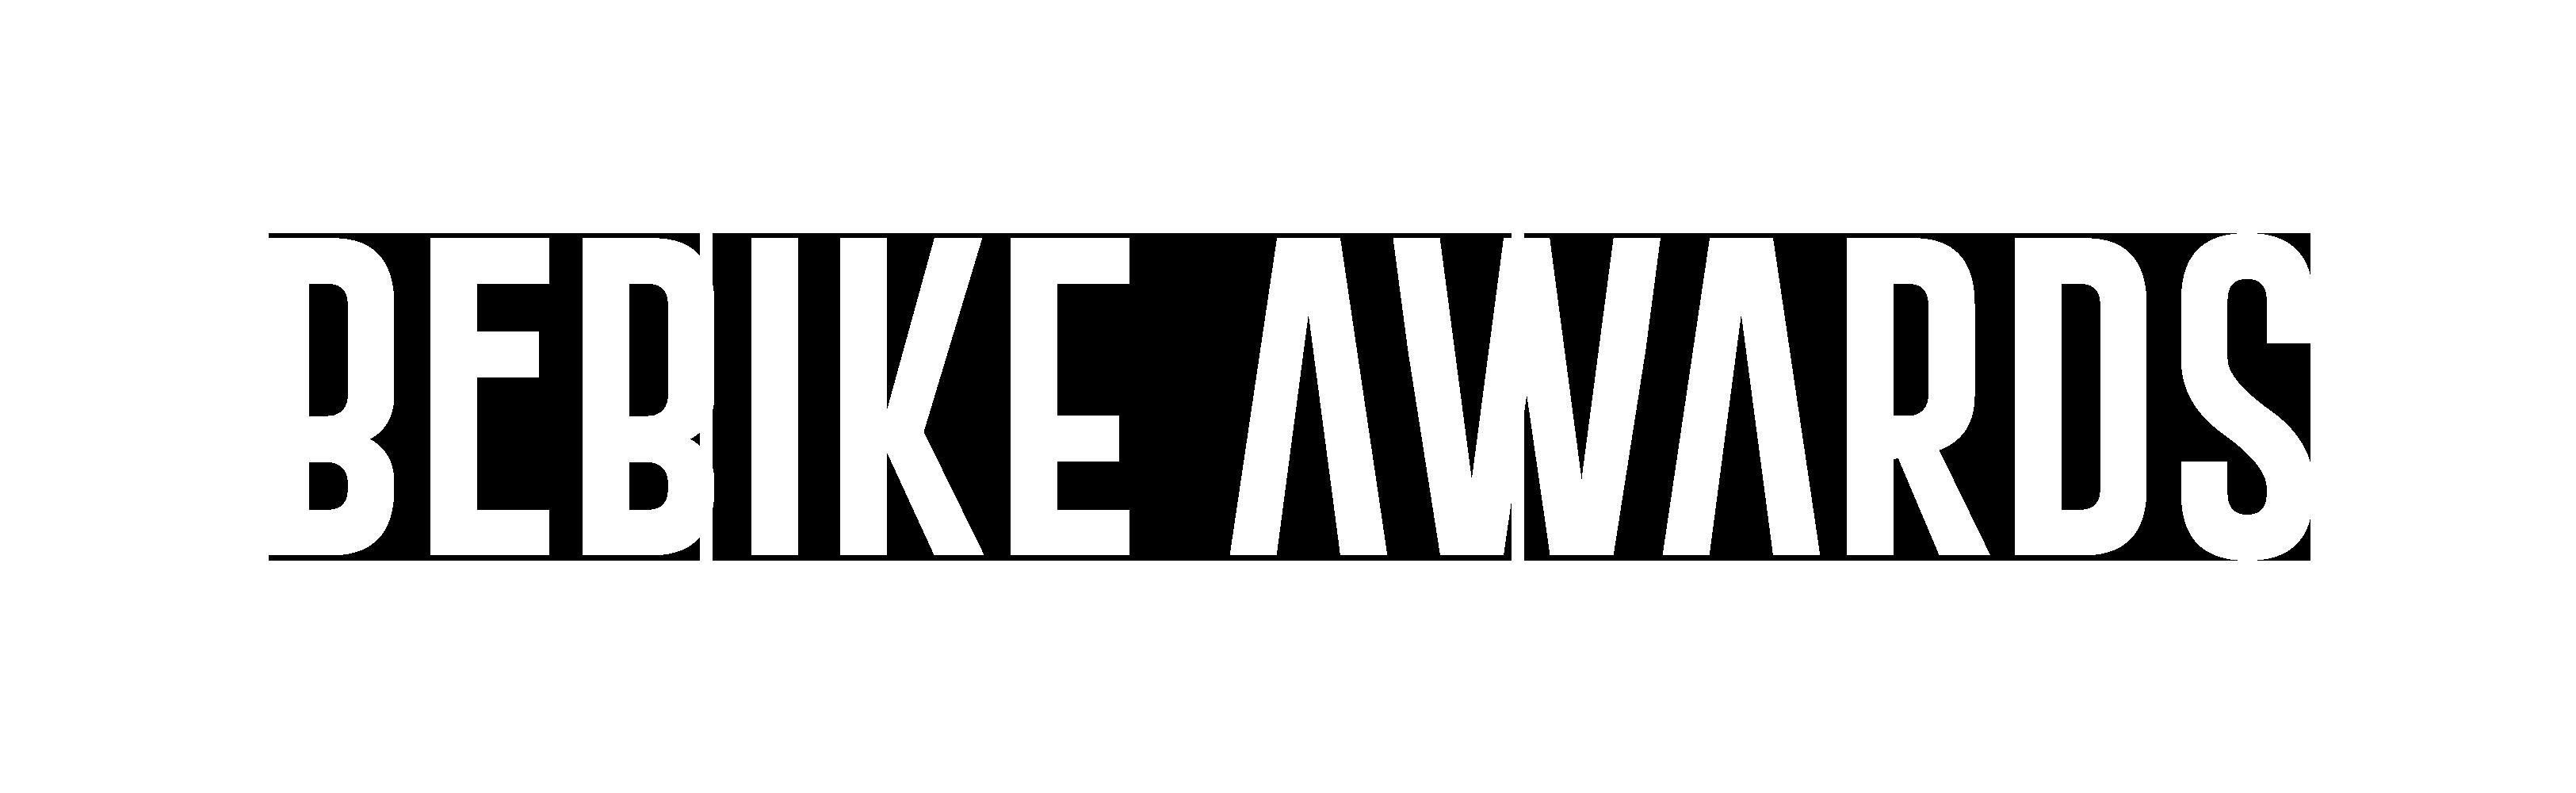 BeBike Awards